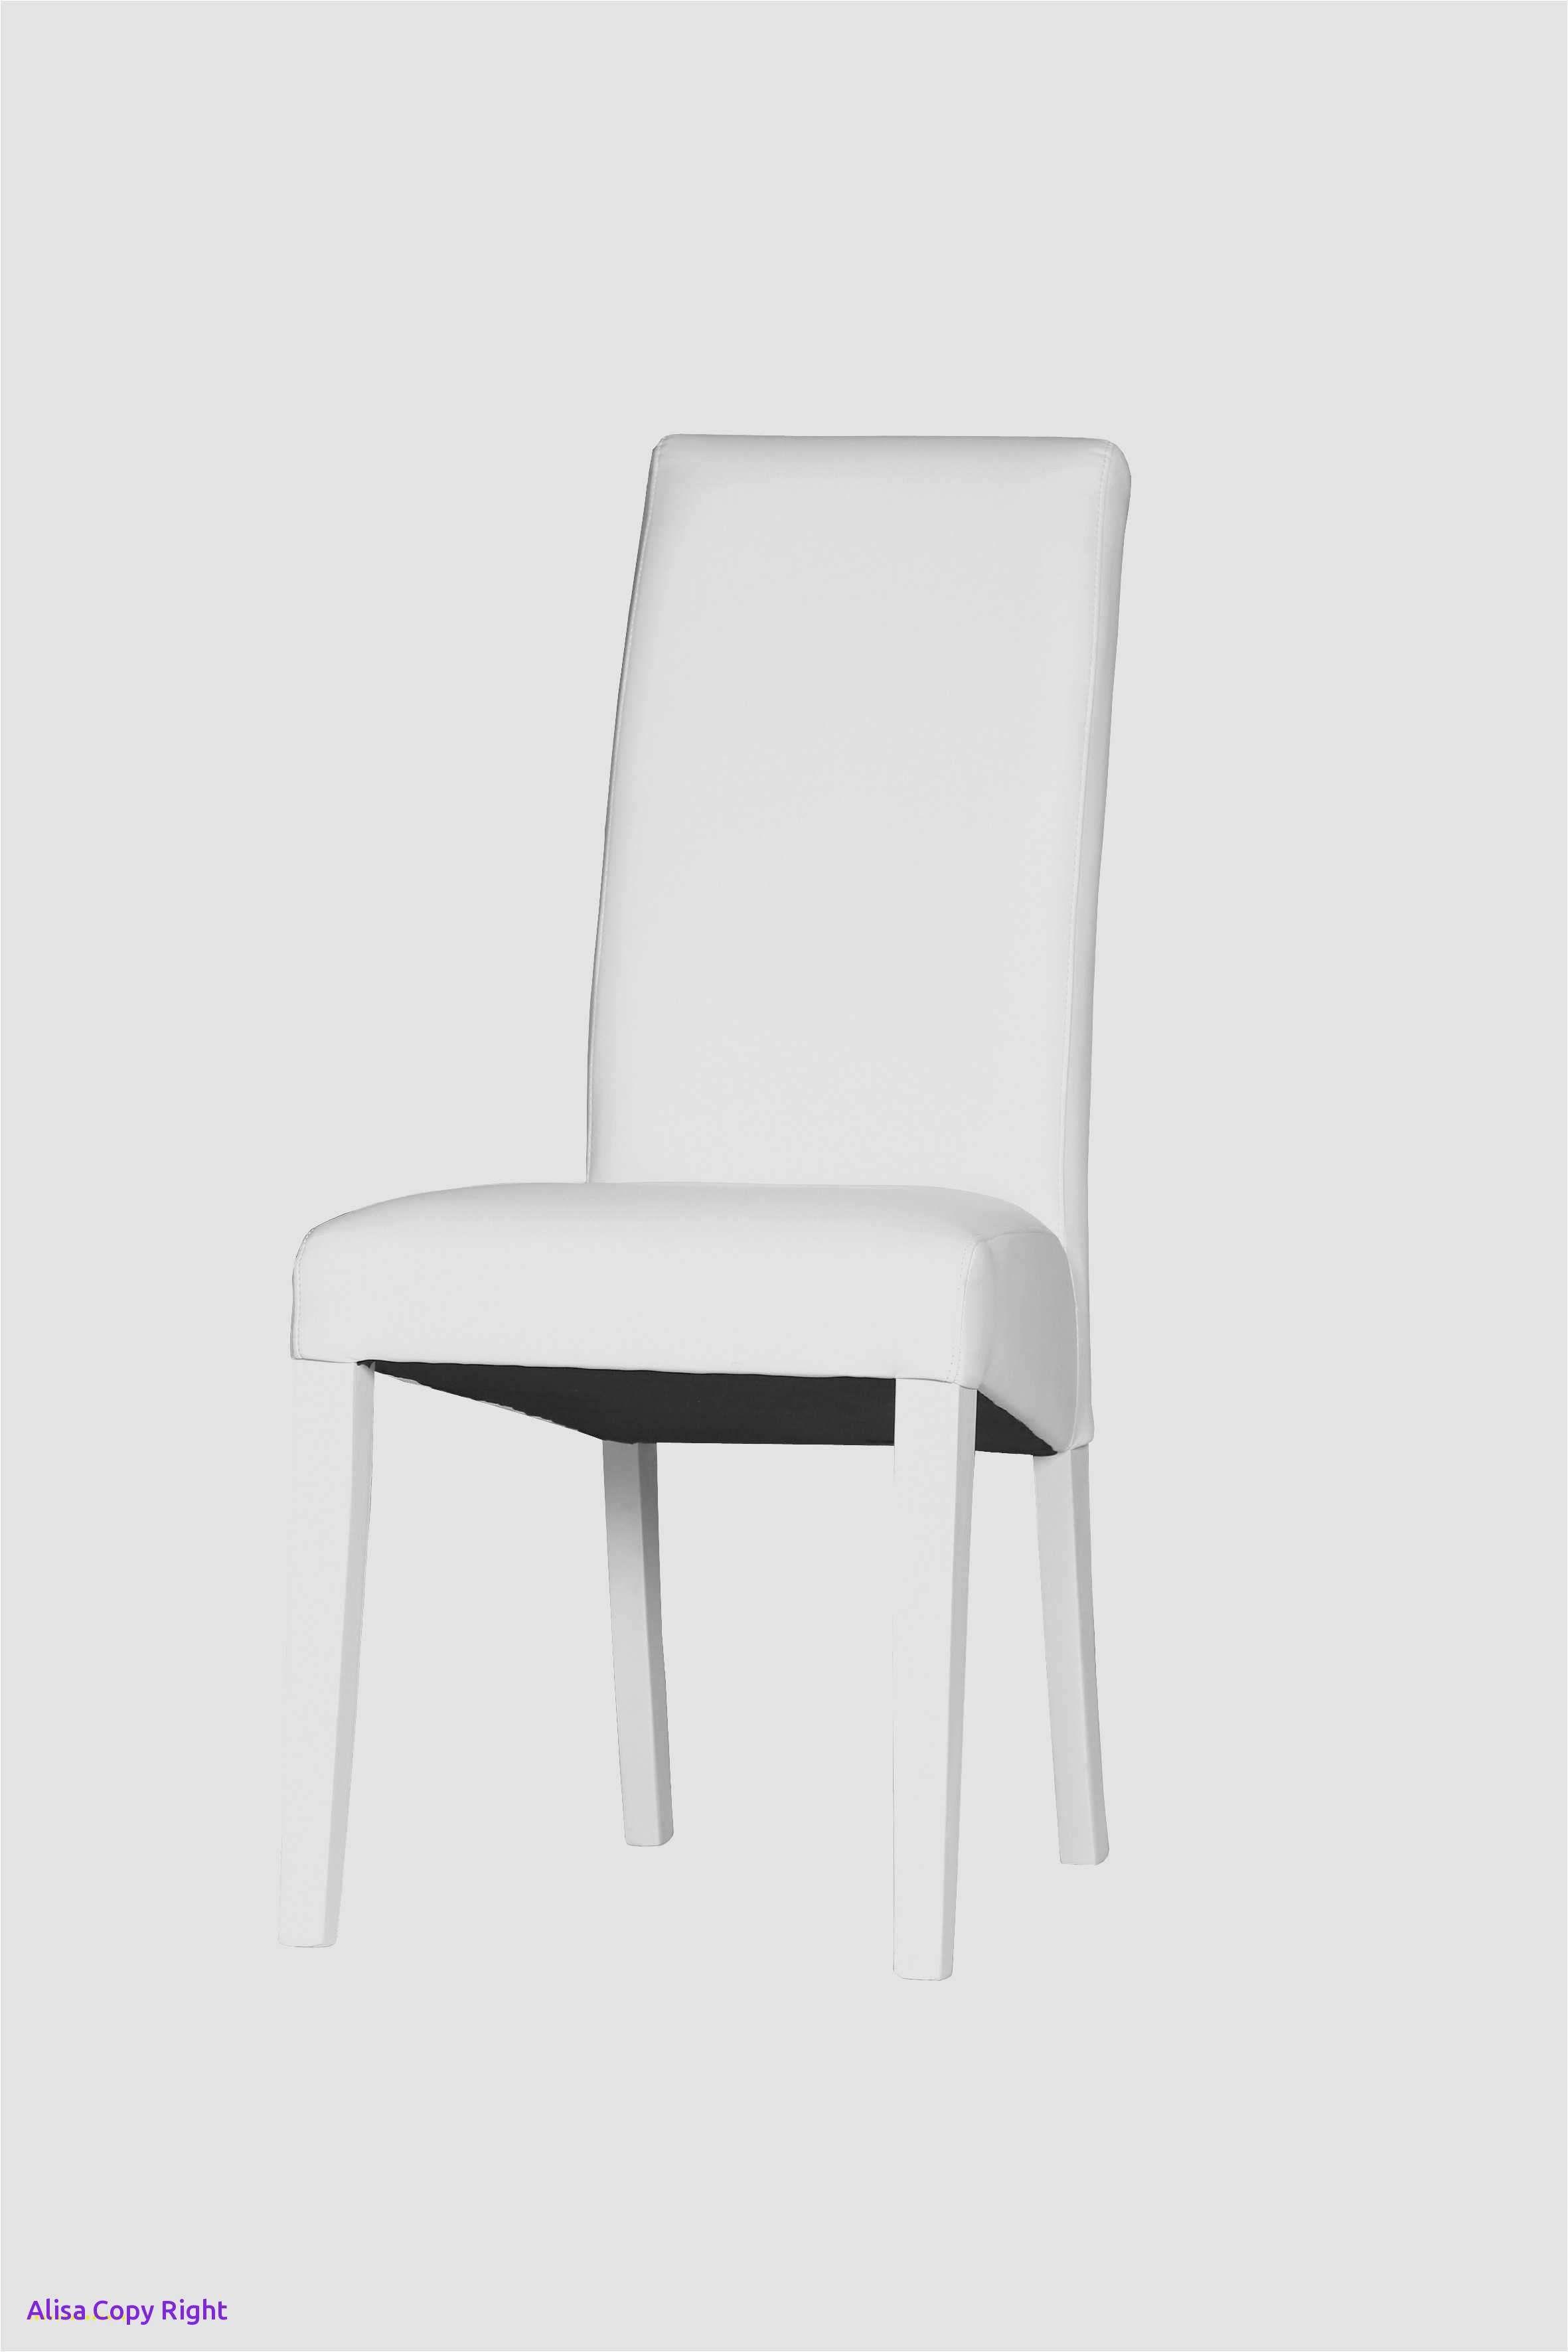 Fresh Plexiglass Table Homedecoration Homedecorations Homedecorationideas Homedecorationtrends Homedecorationincrochet Home Decor Home Design Diy Chair